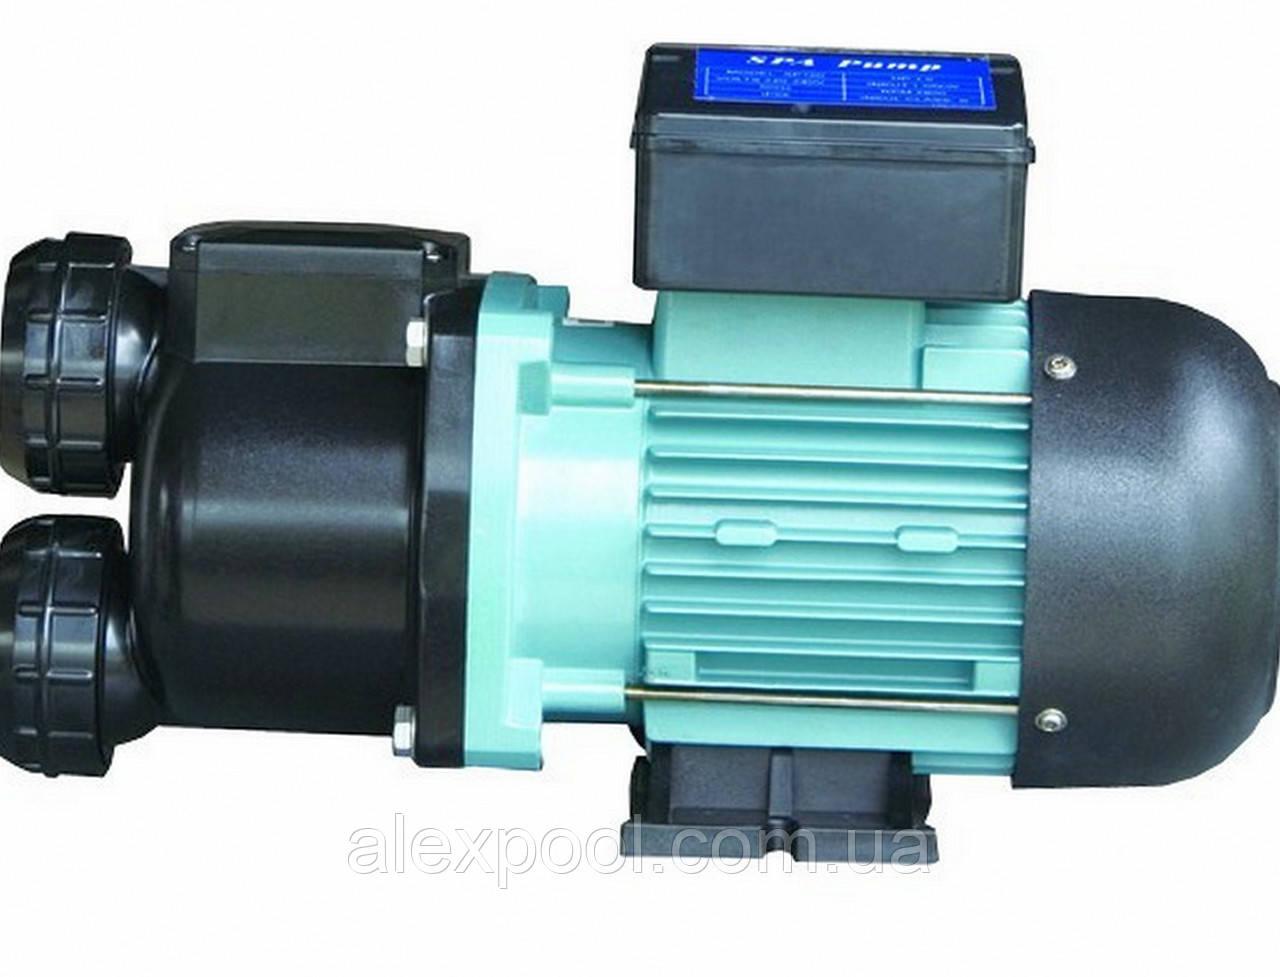 Emaux SP100 Насос для гідромасажу (SP 100, 12,5 м. куб/год, 0,9 кВт, 1,0 HP, 220В)